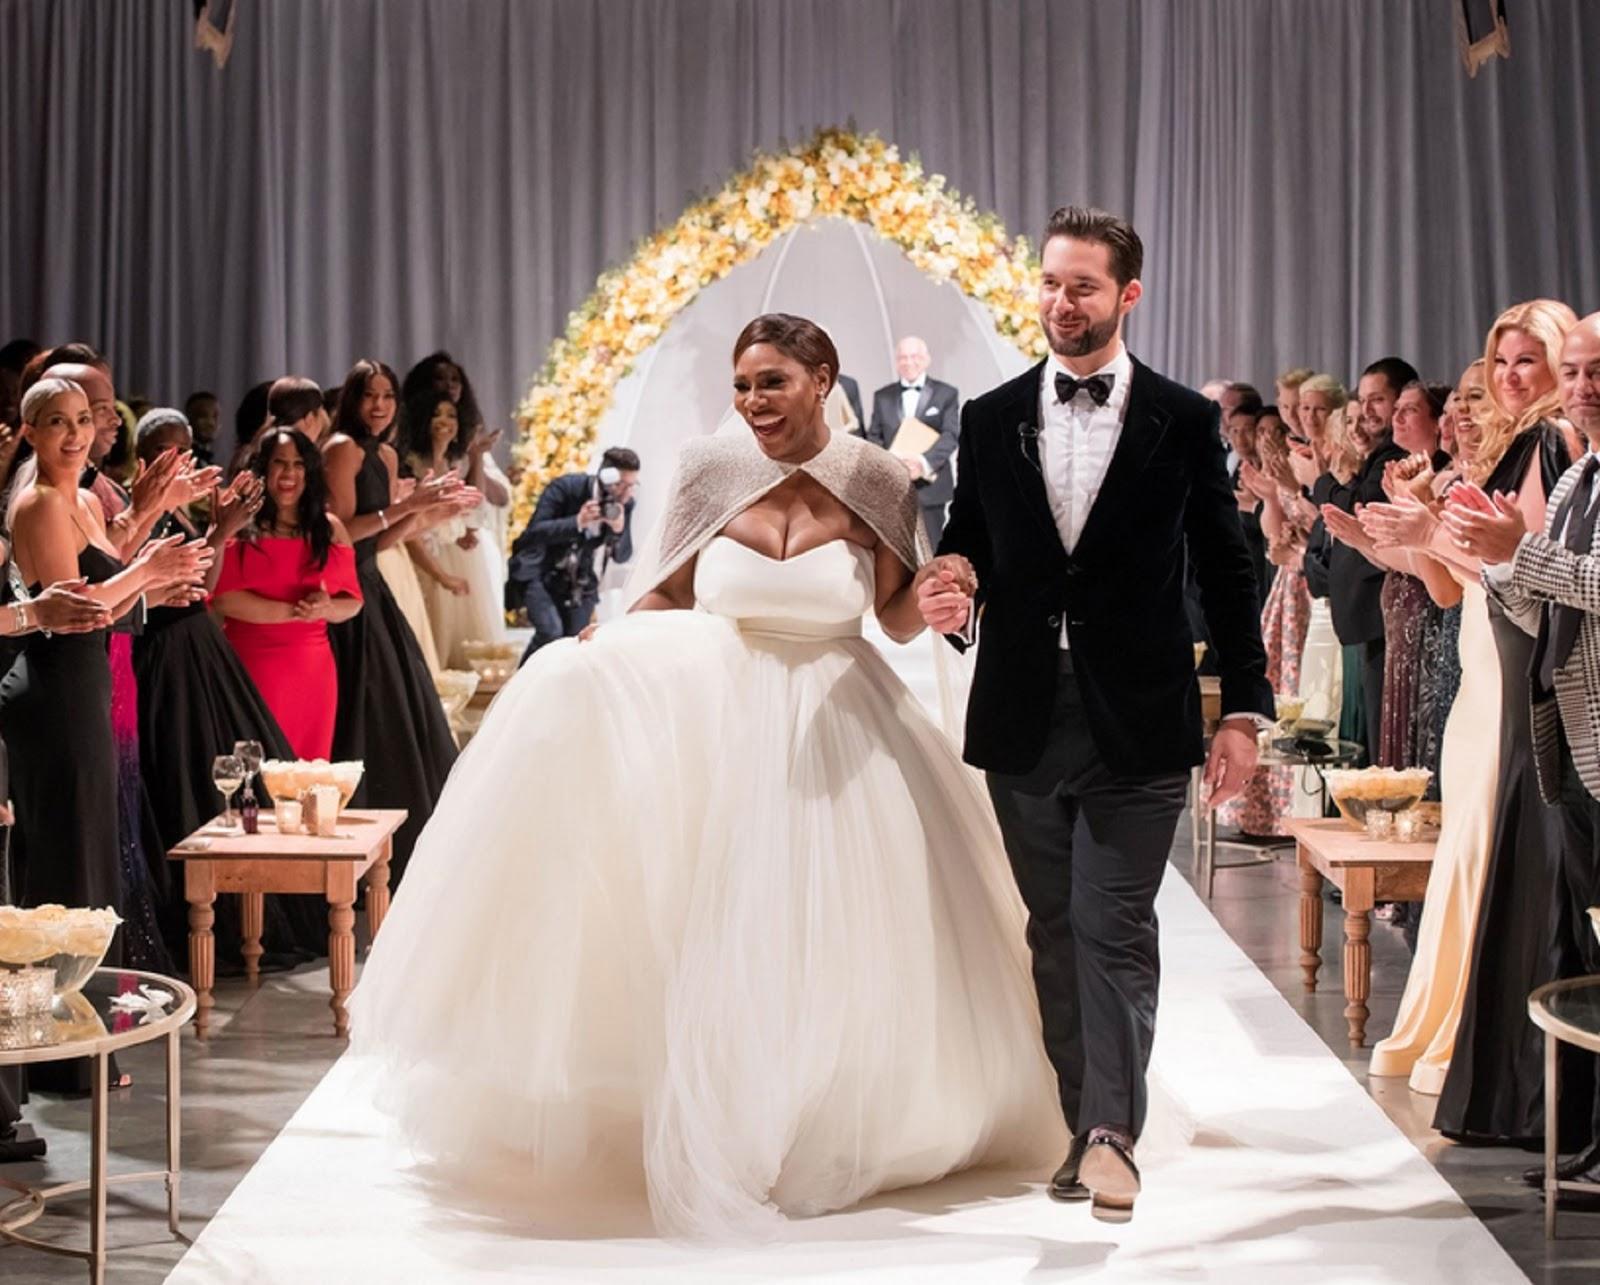 SERENA WILLIAMS, ALEXIS OHANIAN WEDDING 2